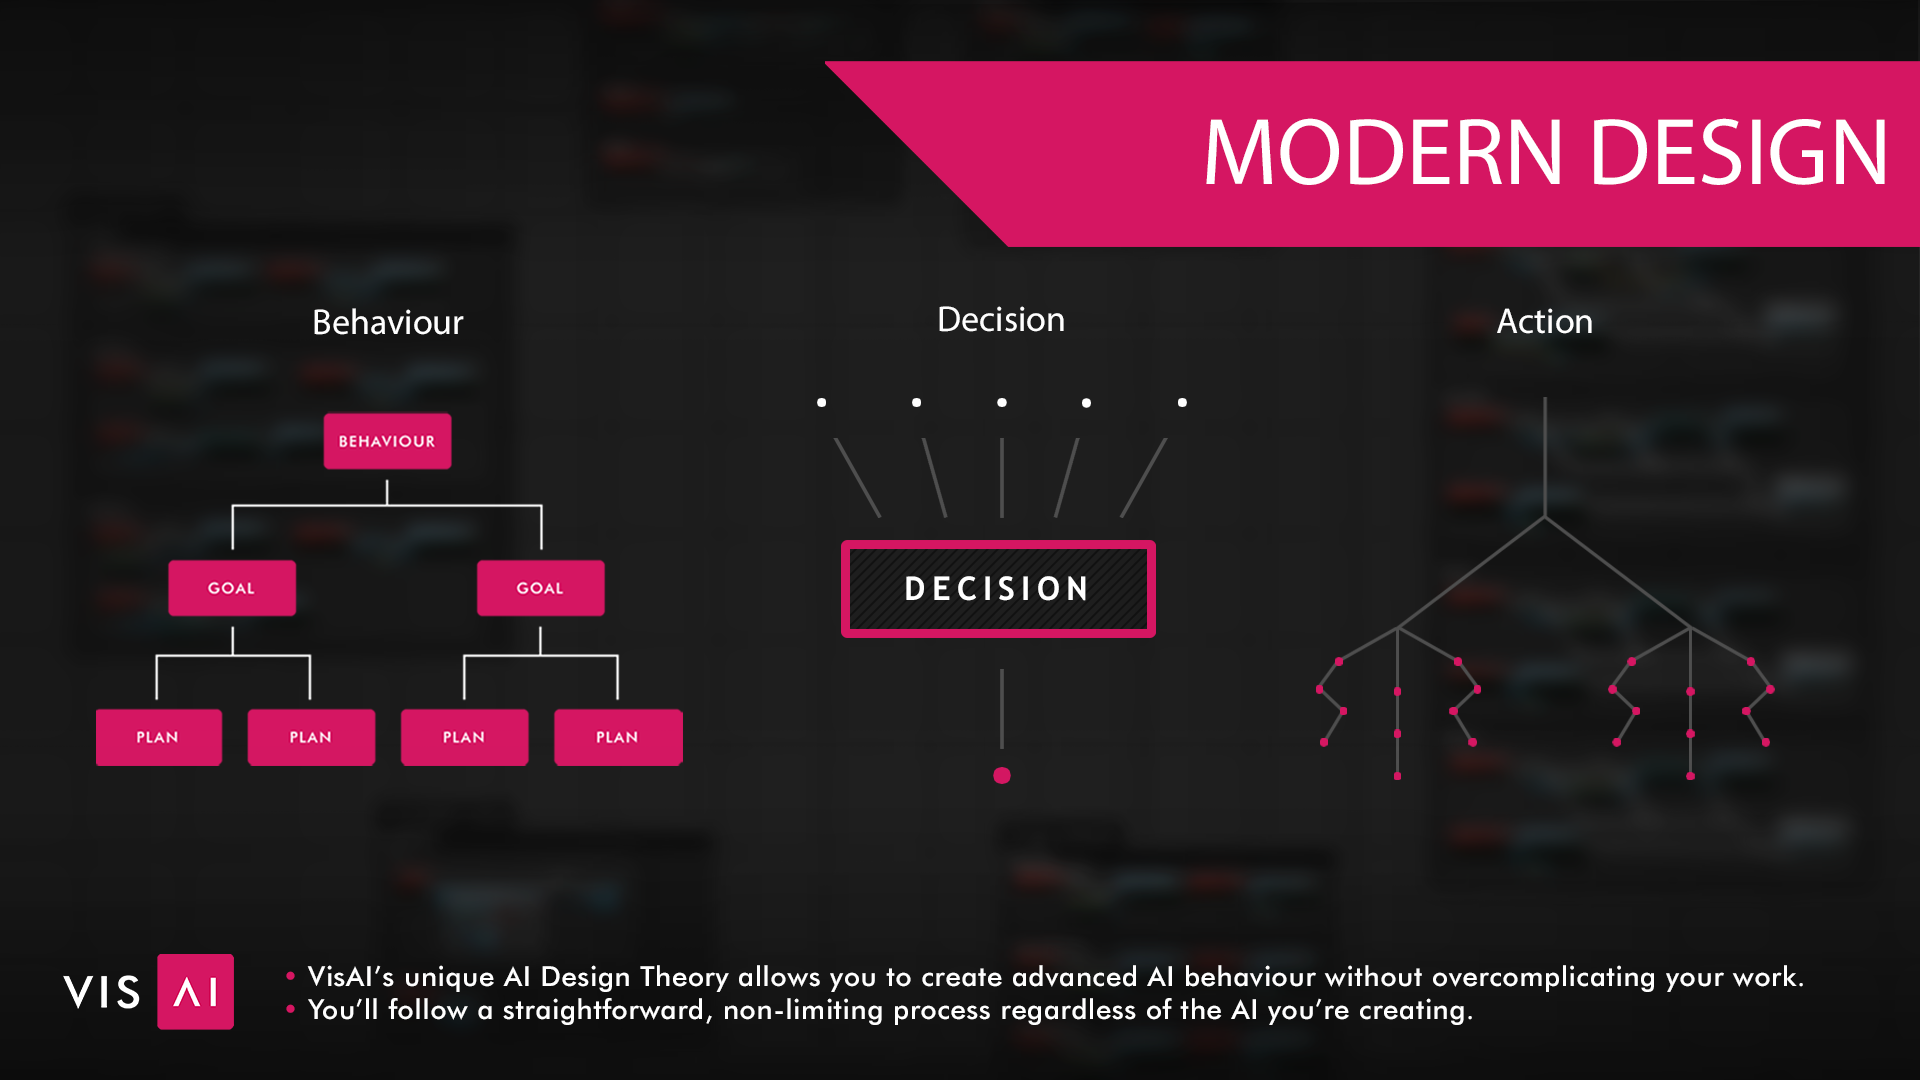 3 MODERN DESIGN